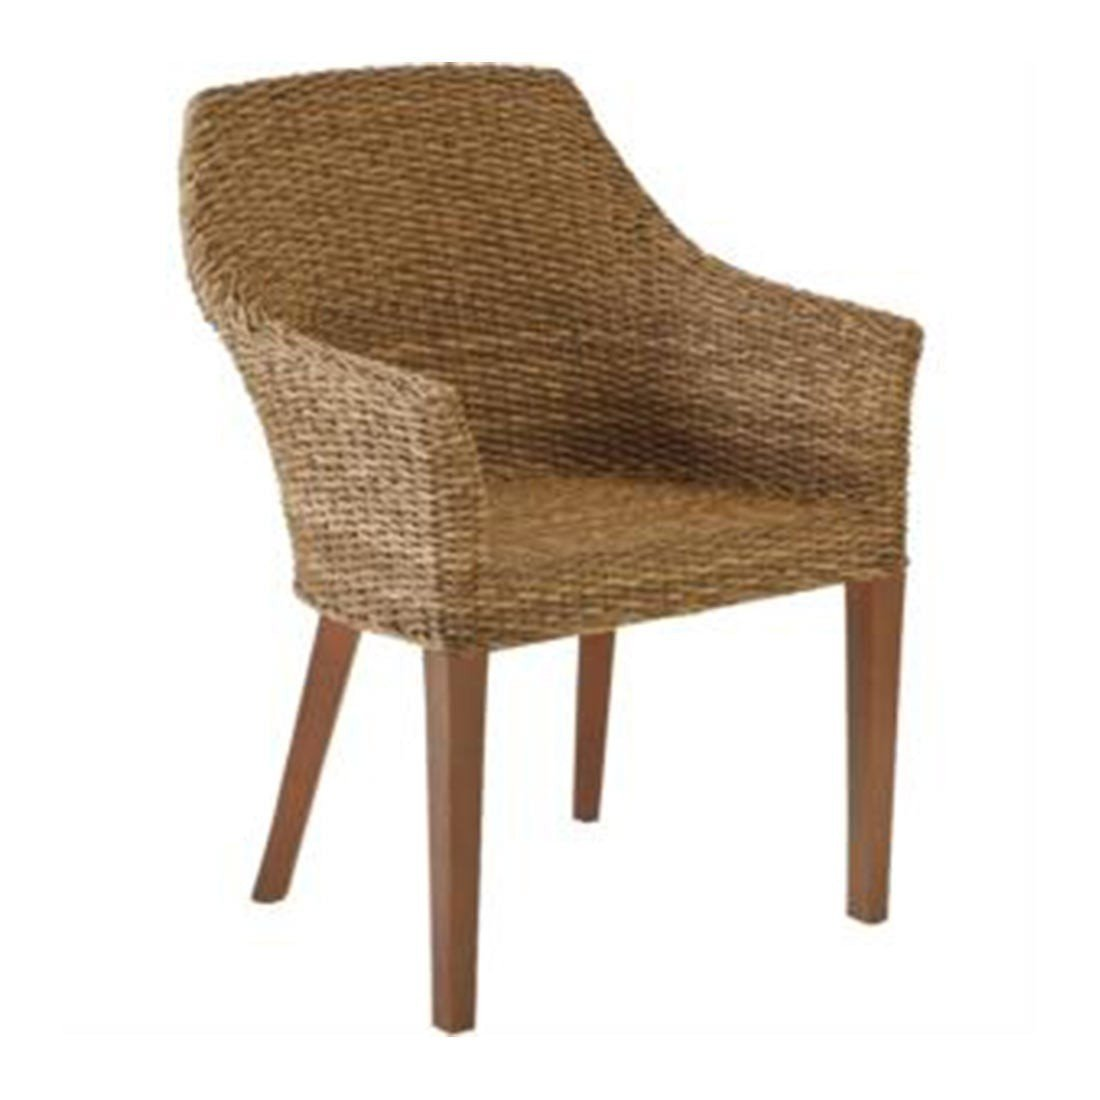 MBM_tuinstoel_fauteuil_tortuga_wicker_resysta_borneo_Zitteninjetuin_06